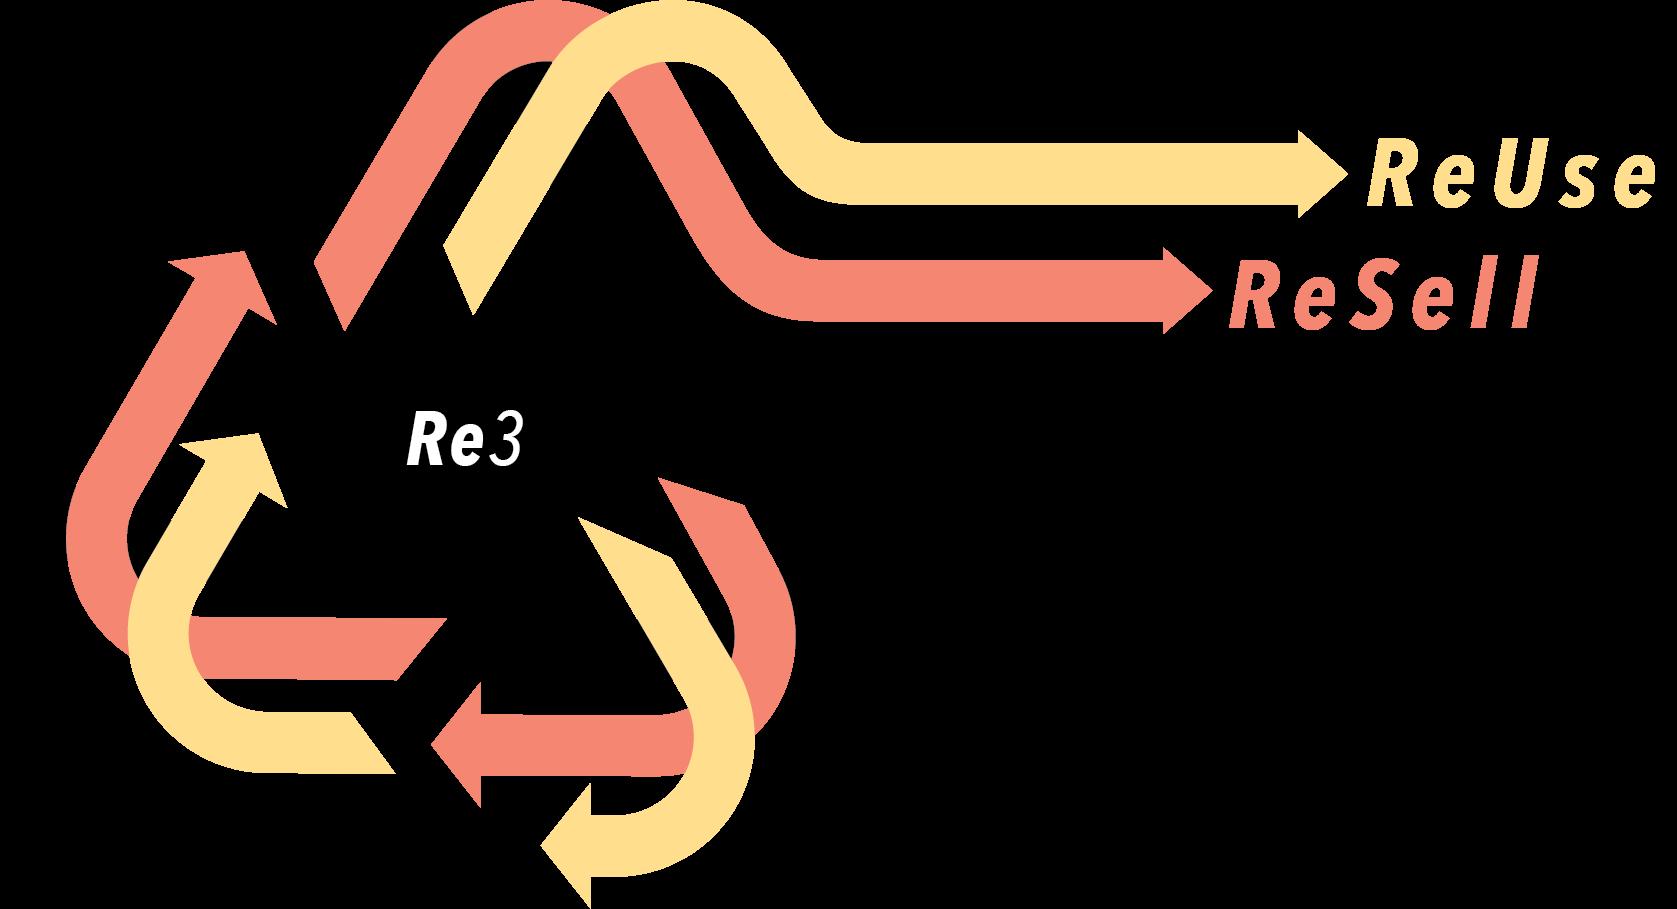 Re3 Model ReUse ReSell ReGenerate